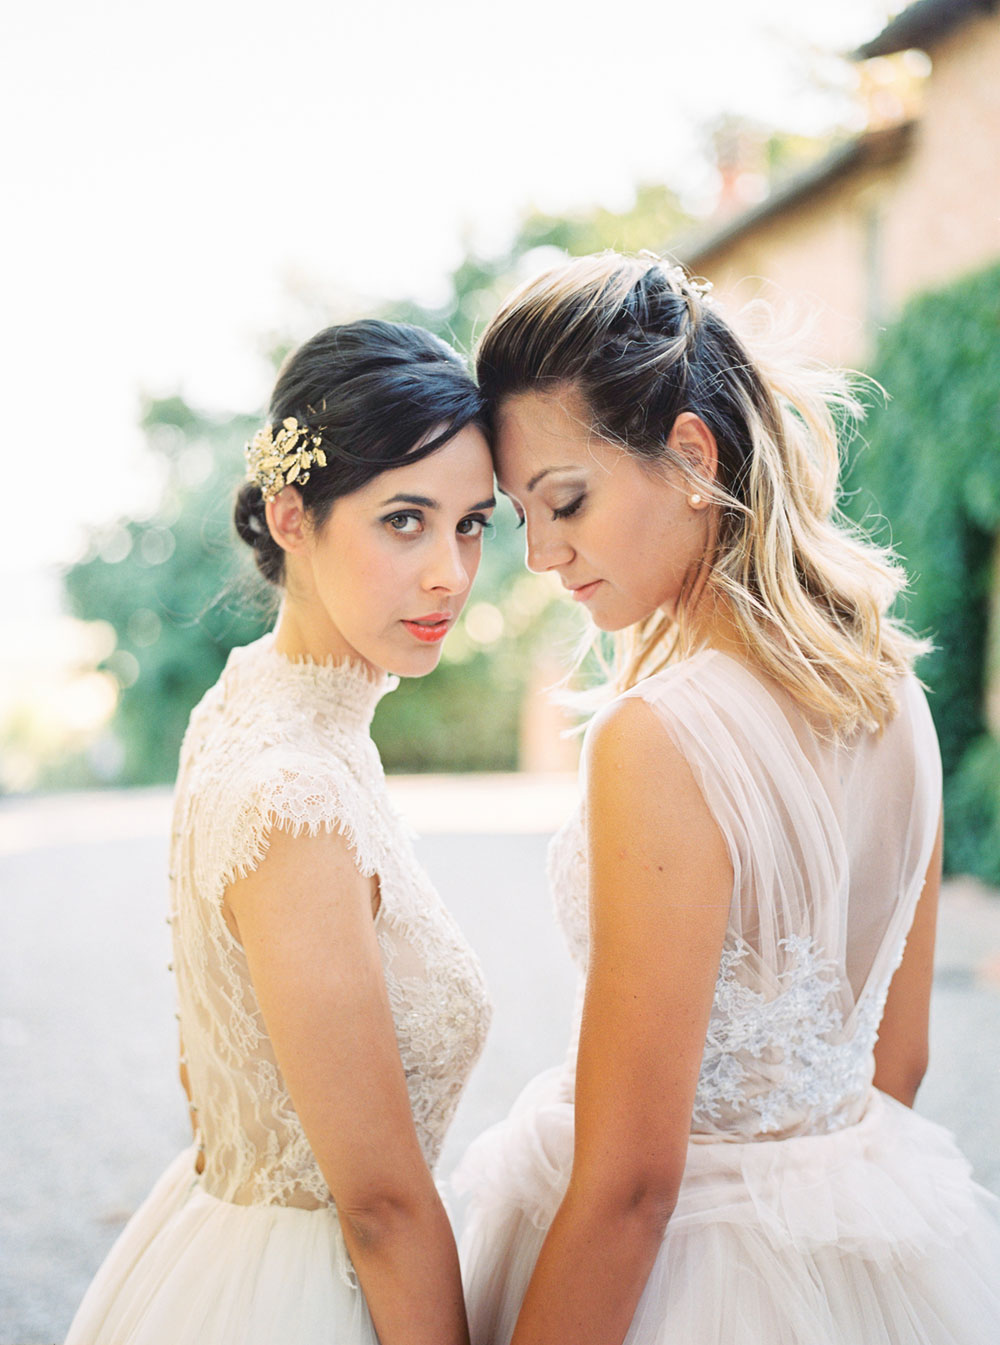 Linari-Tuscany-Elopement-Courtney-Michaela-155